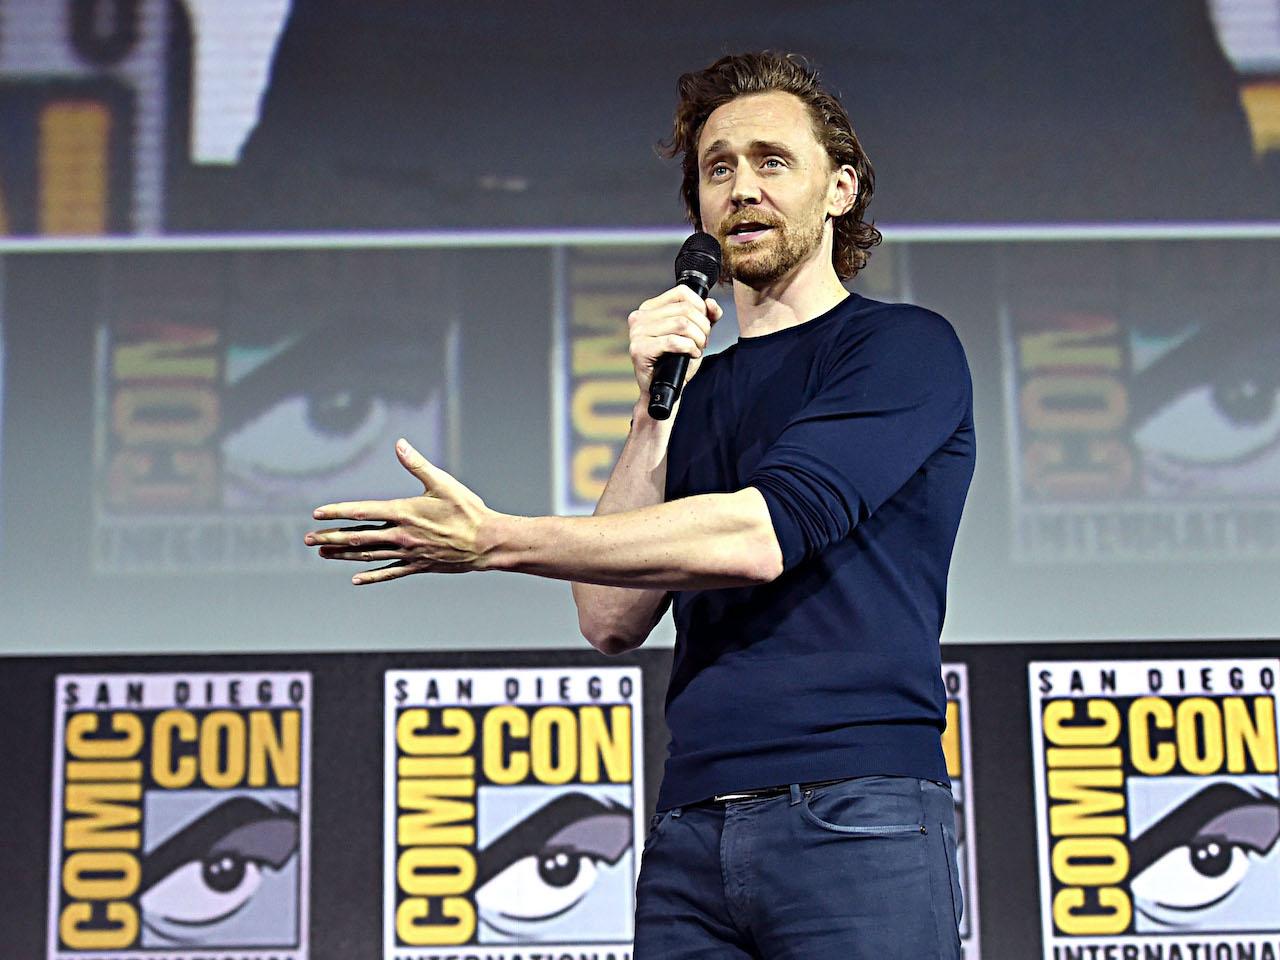 Tom Hiddleston of Marvel Studios' 'Loki' at the San Diego Comic-Con